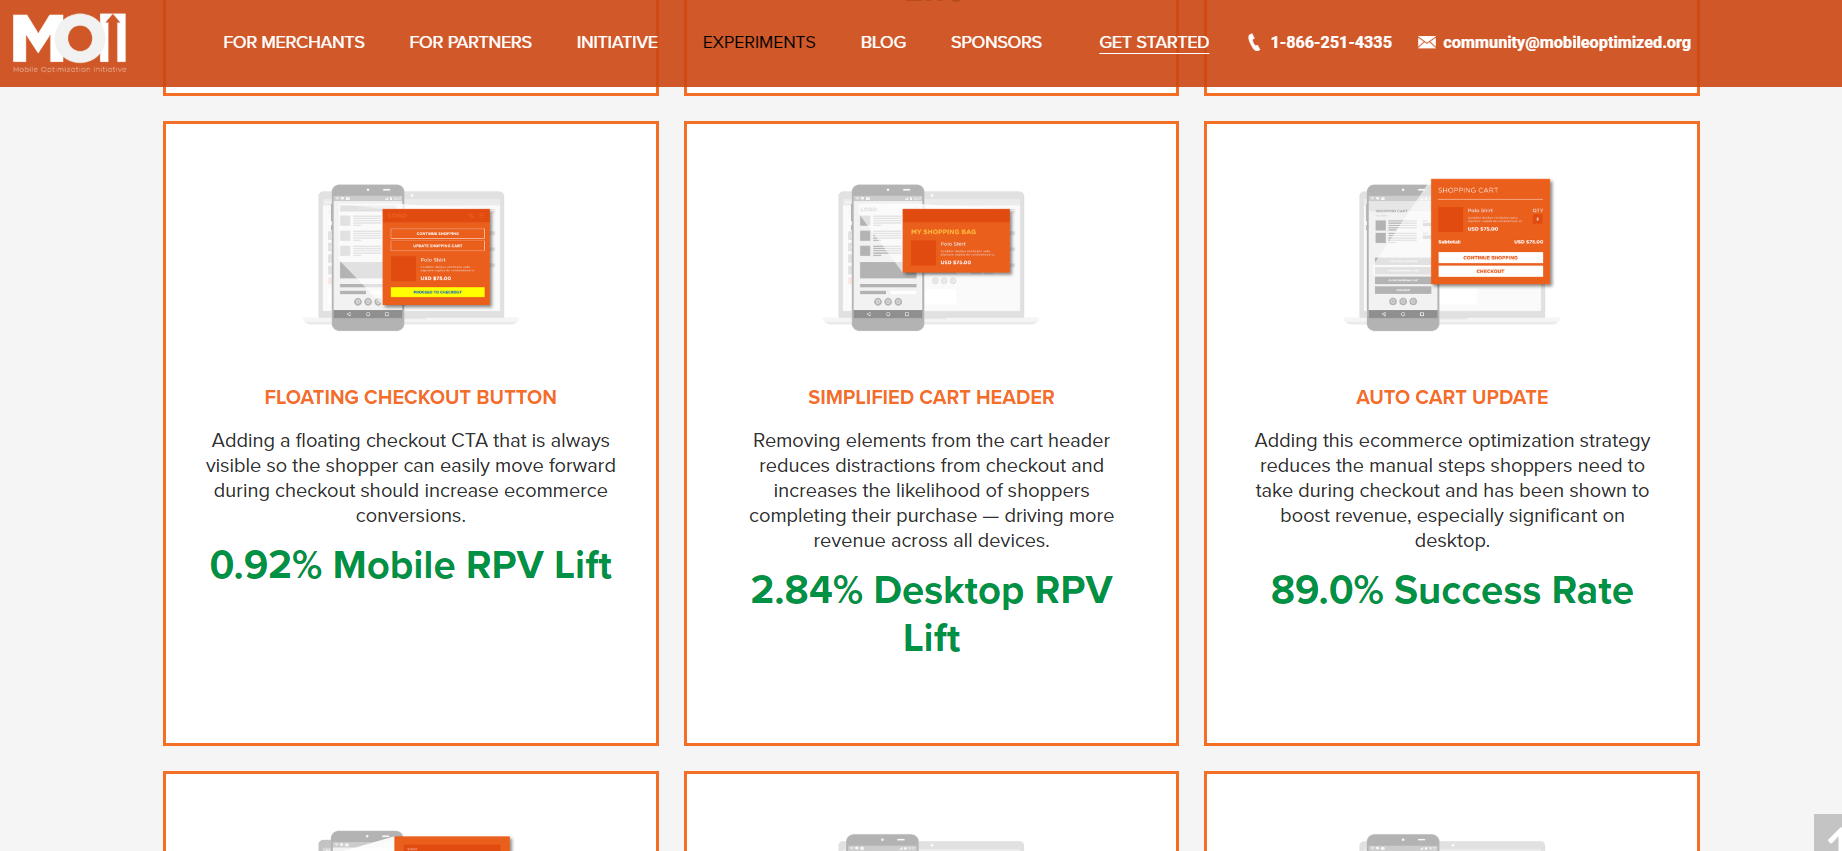 Mobile eCommerce Optimization Initiative